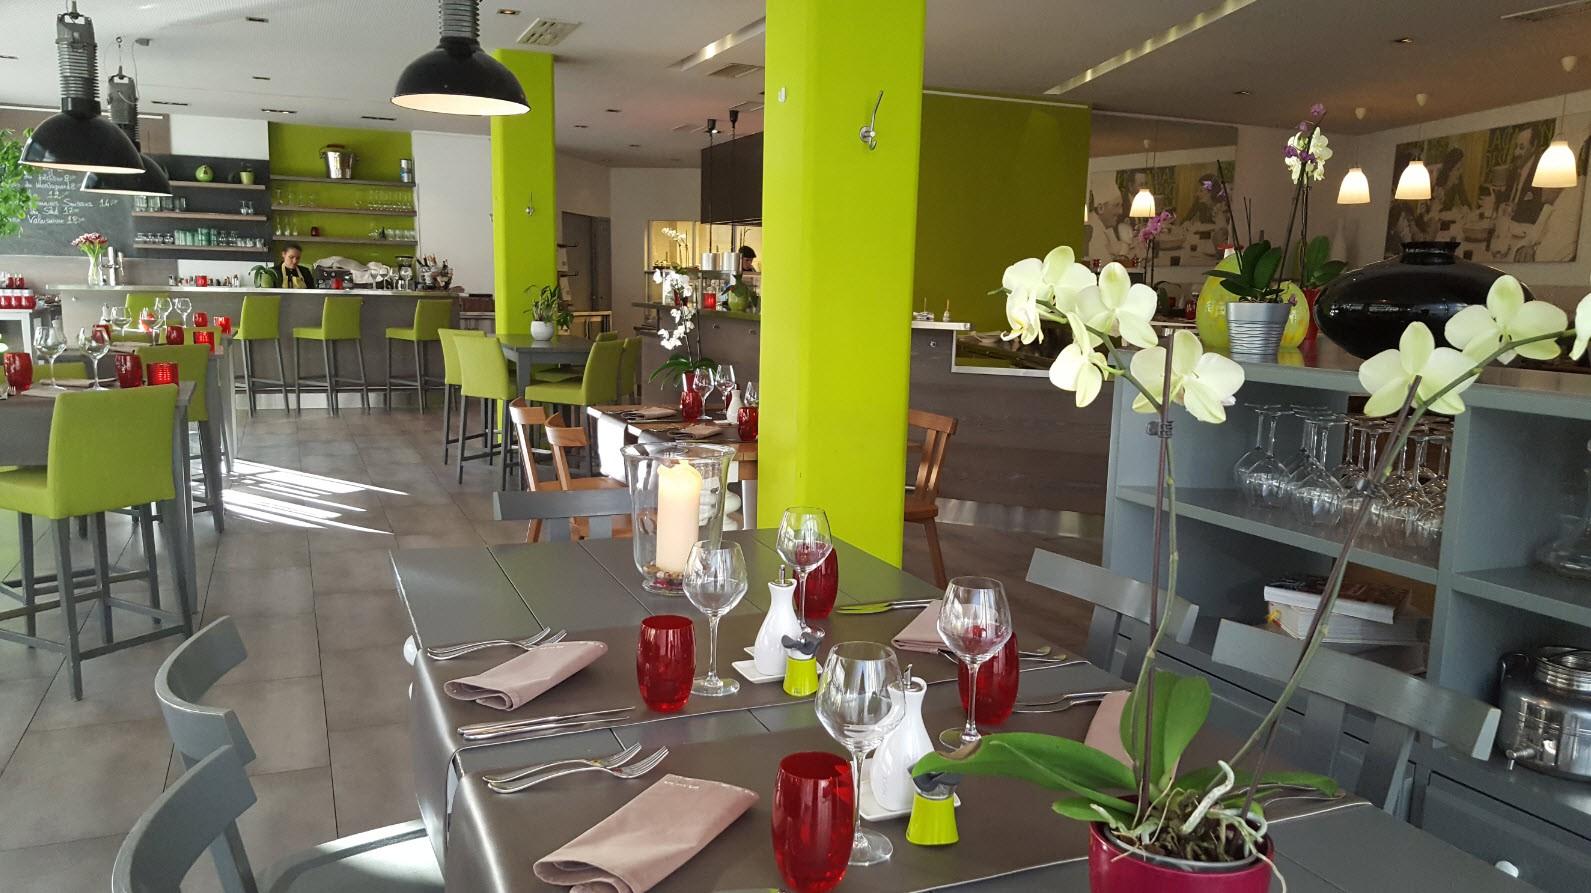 Restaurant la cantine des commer ants gen ve for Ambiance cuisine geneve